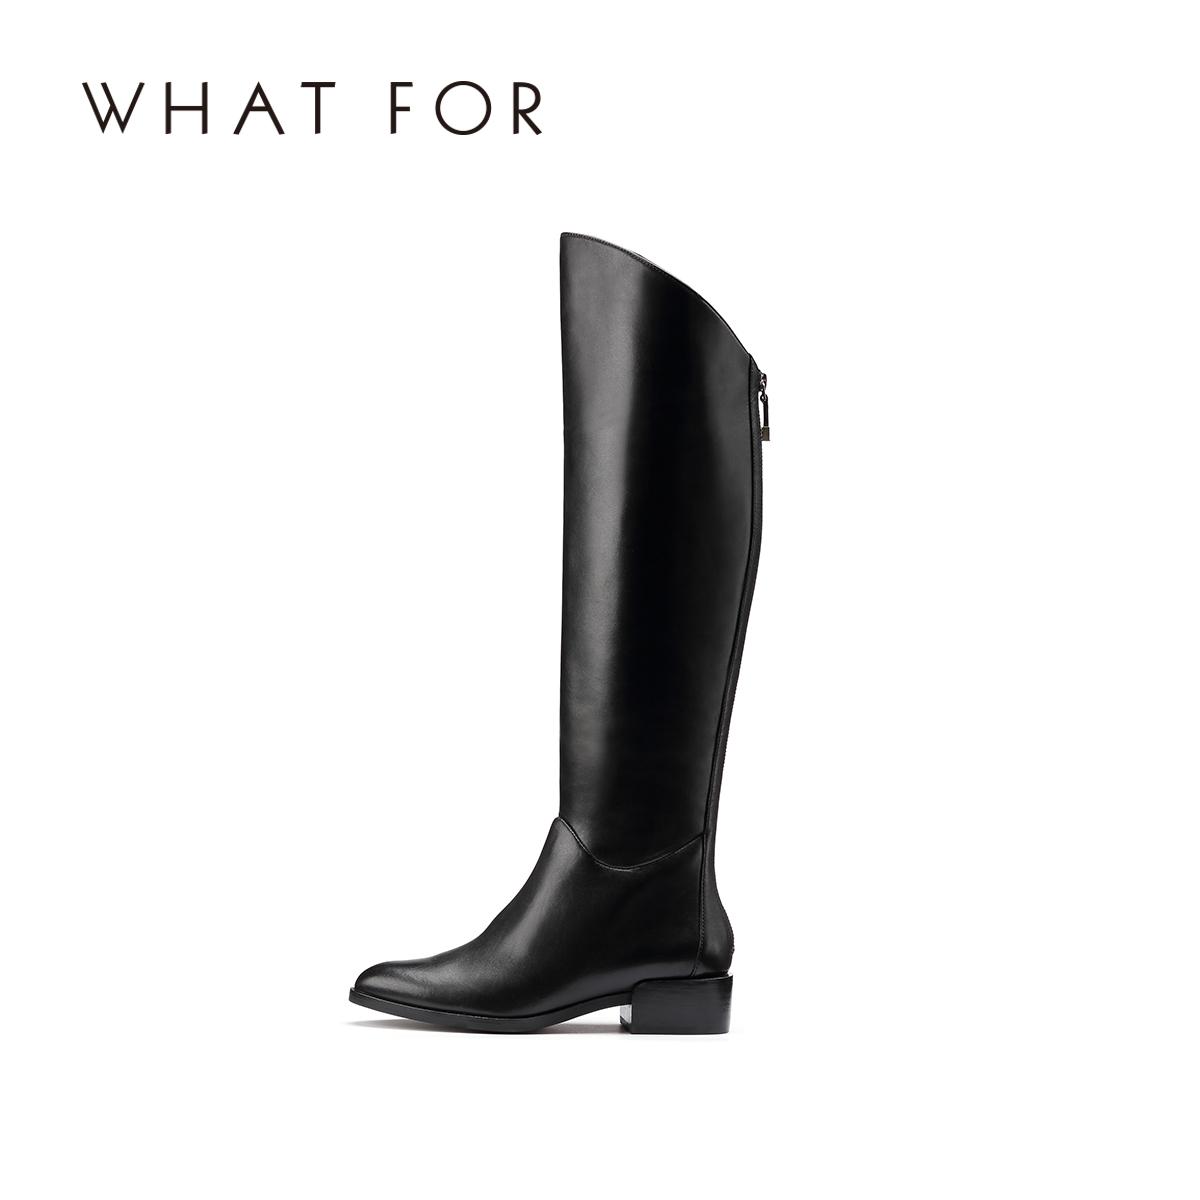 WHAT FOR 秋冬牛皮及膝靴直筒女士长靴骑士靴马靴 WF301L40267